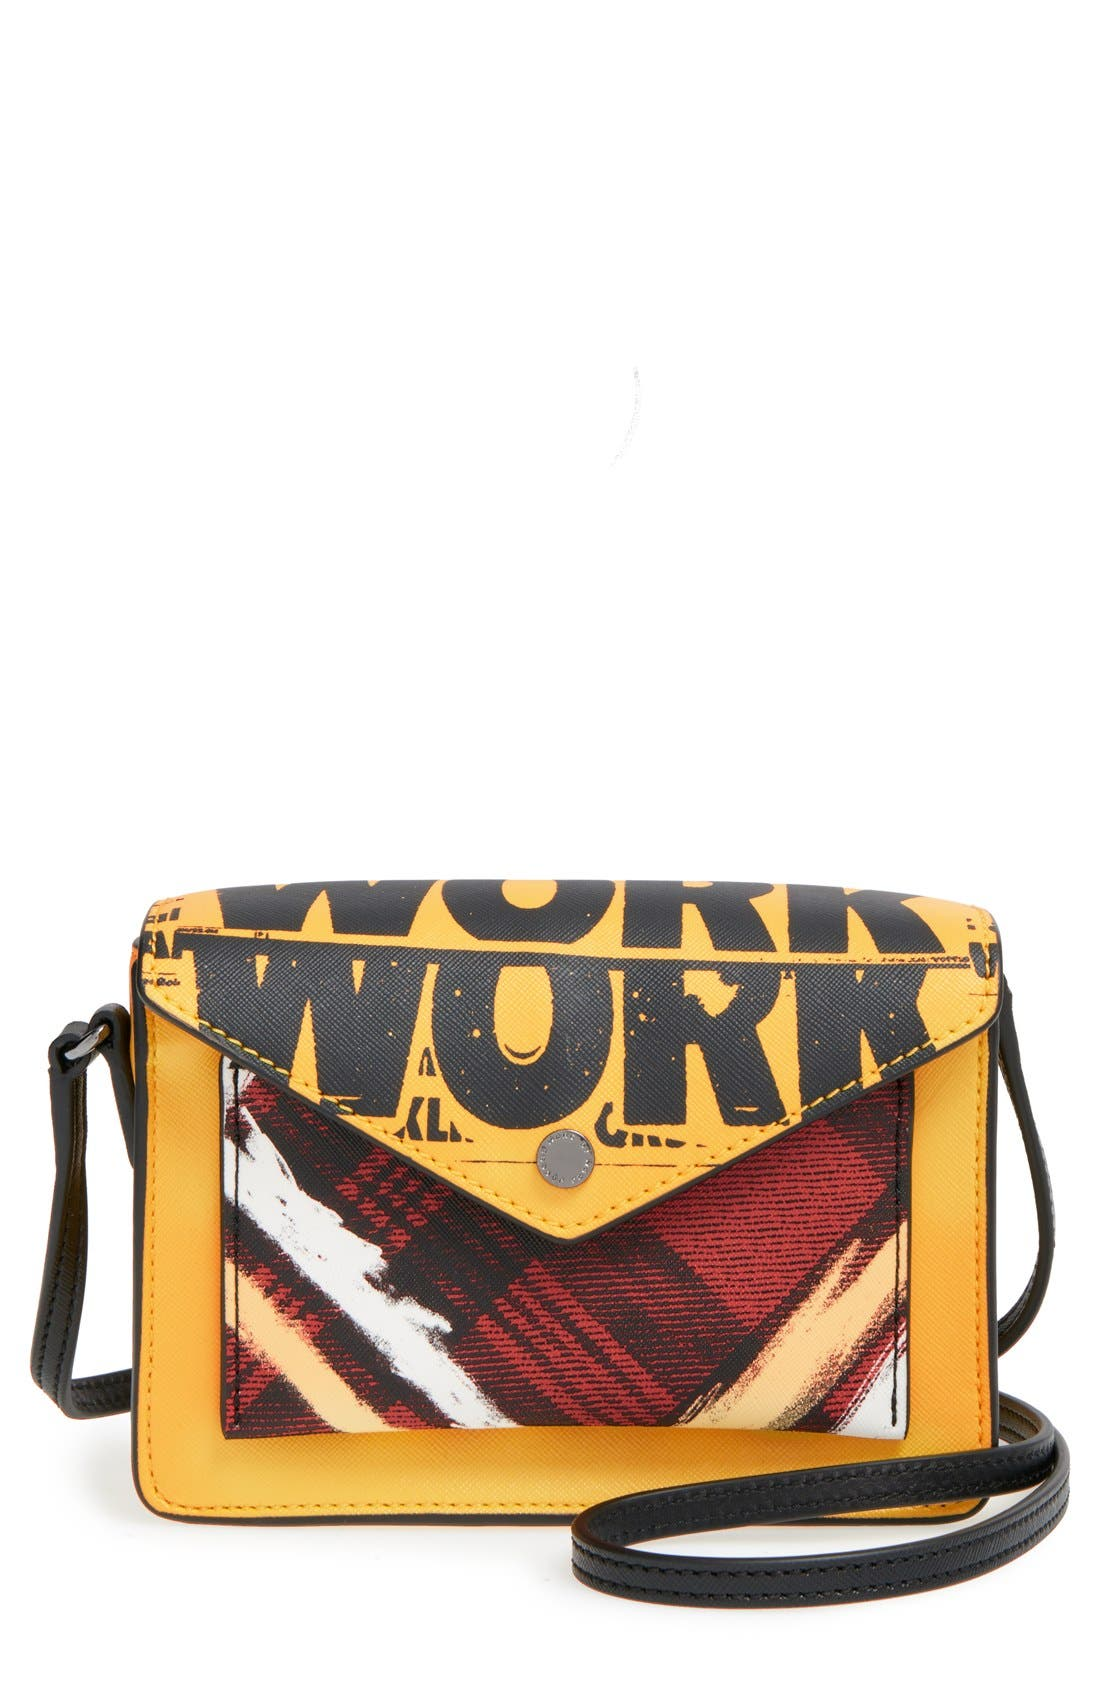 Alternate Image 1 Selected - MARC BY MARC JACOBS 'Metropoli' Envelope Crossbody Bag